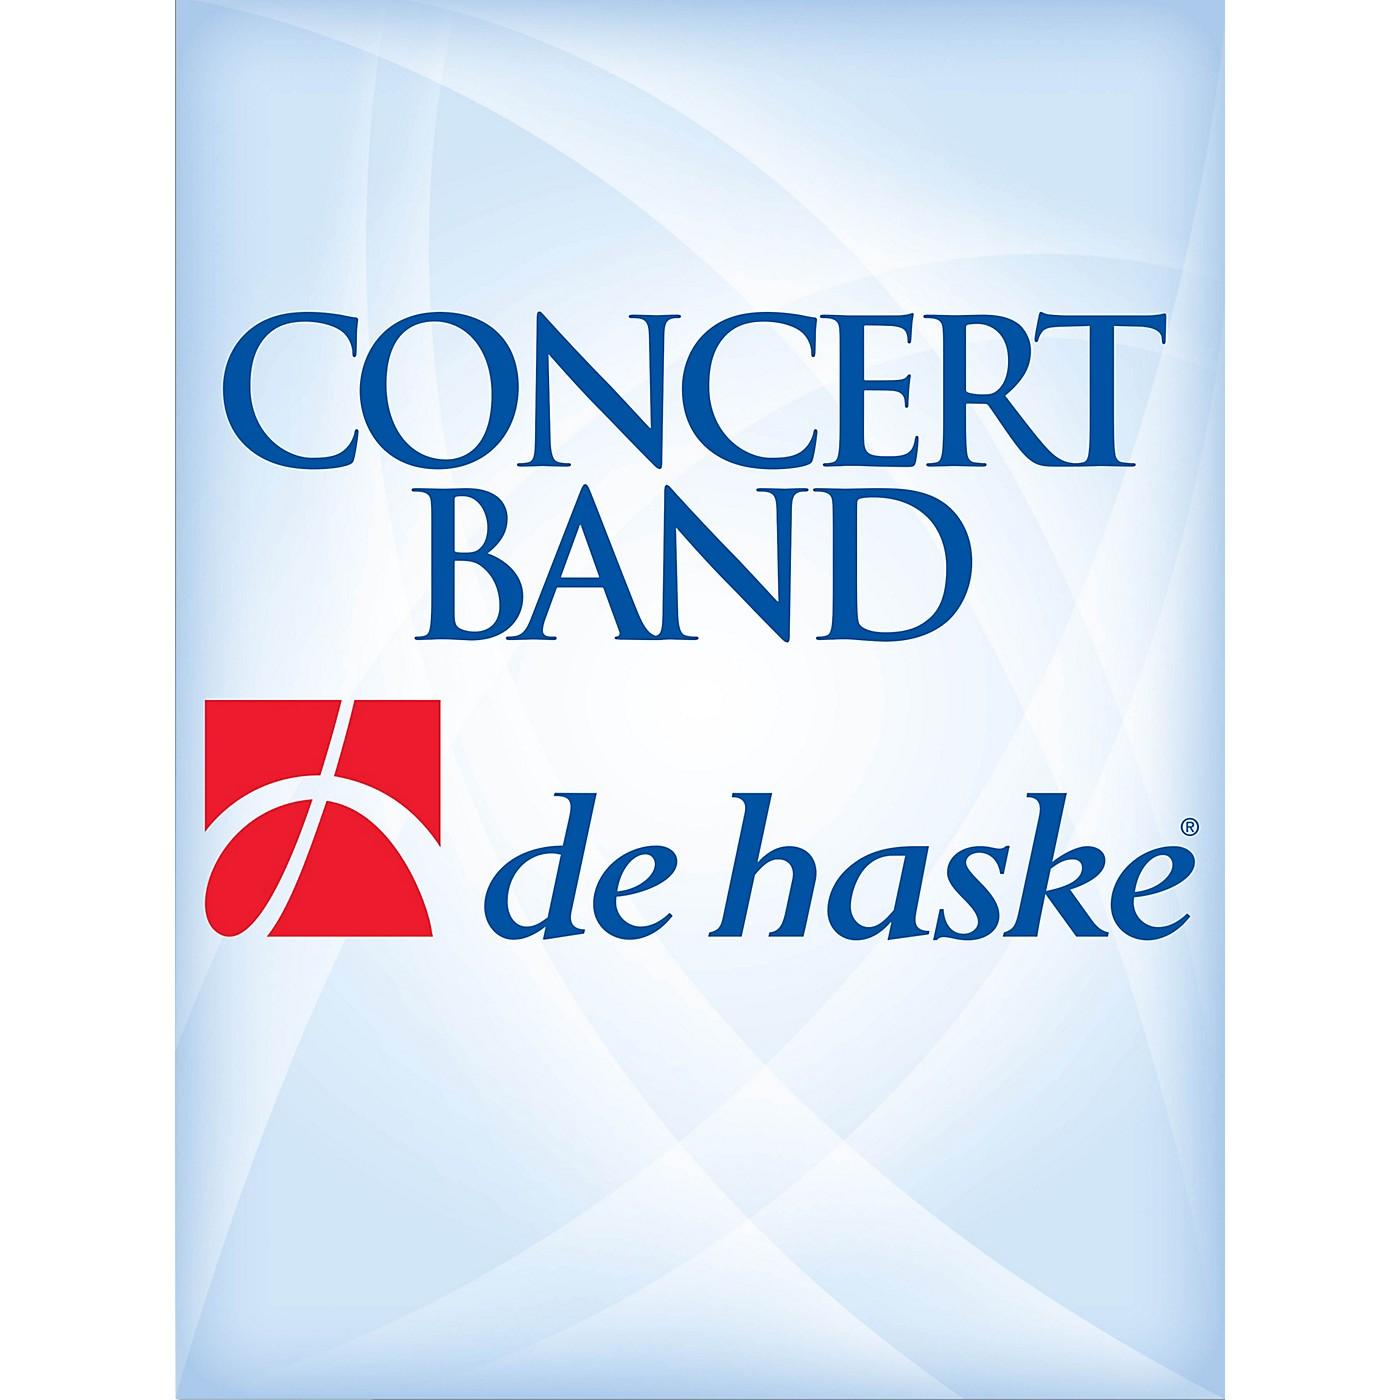 Hal Leonard Clari-fun-key Concert Band Level 4 thumbnail